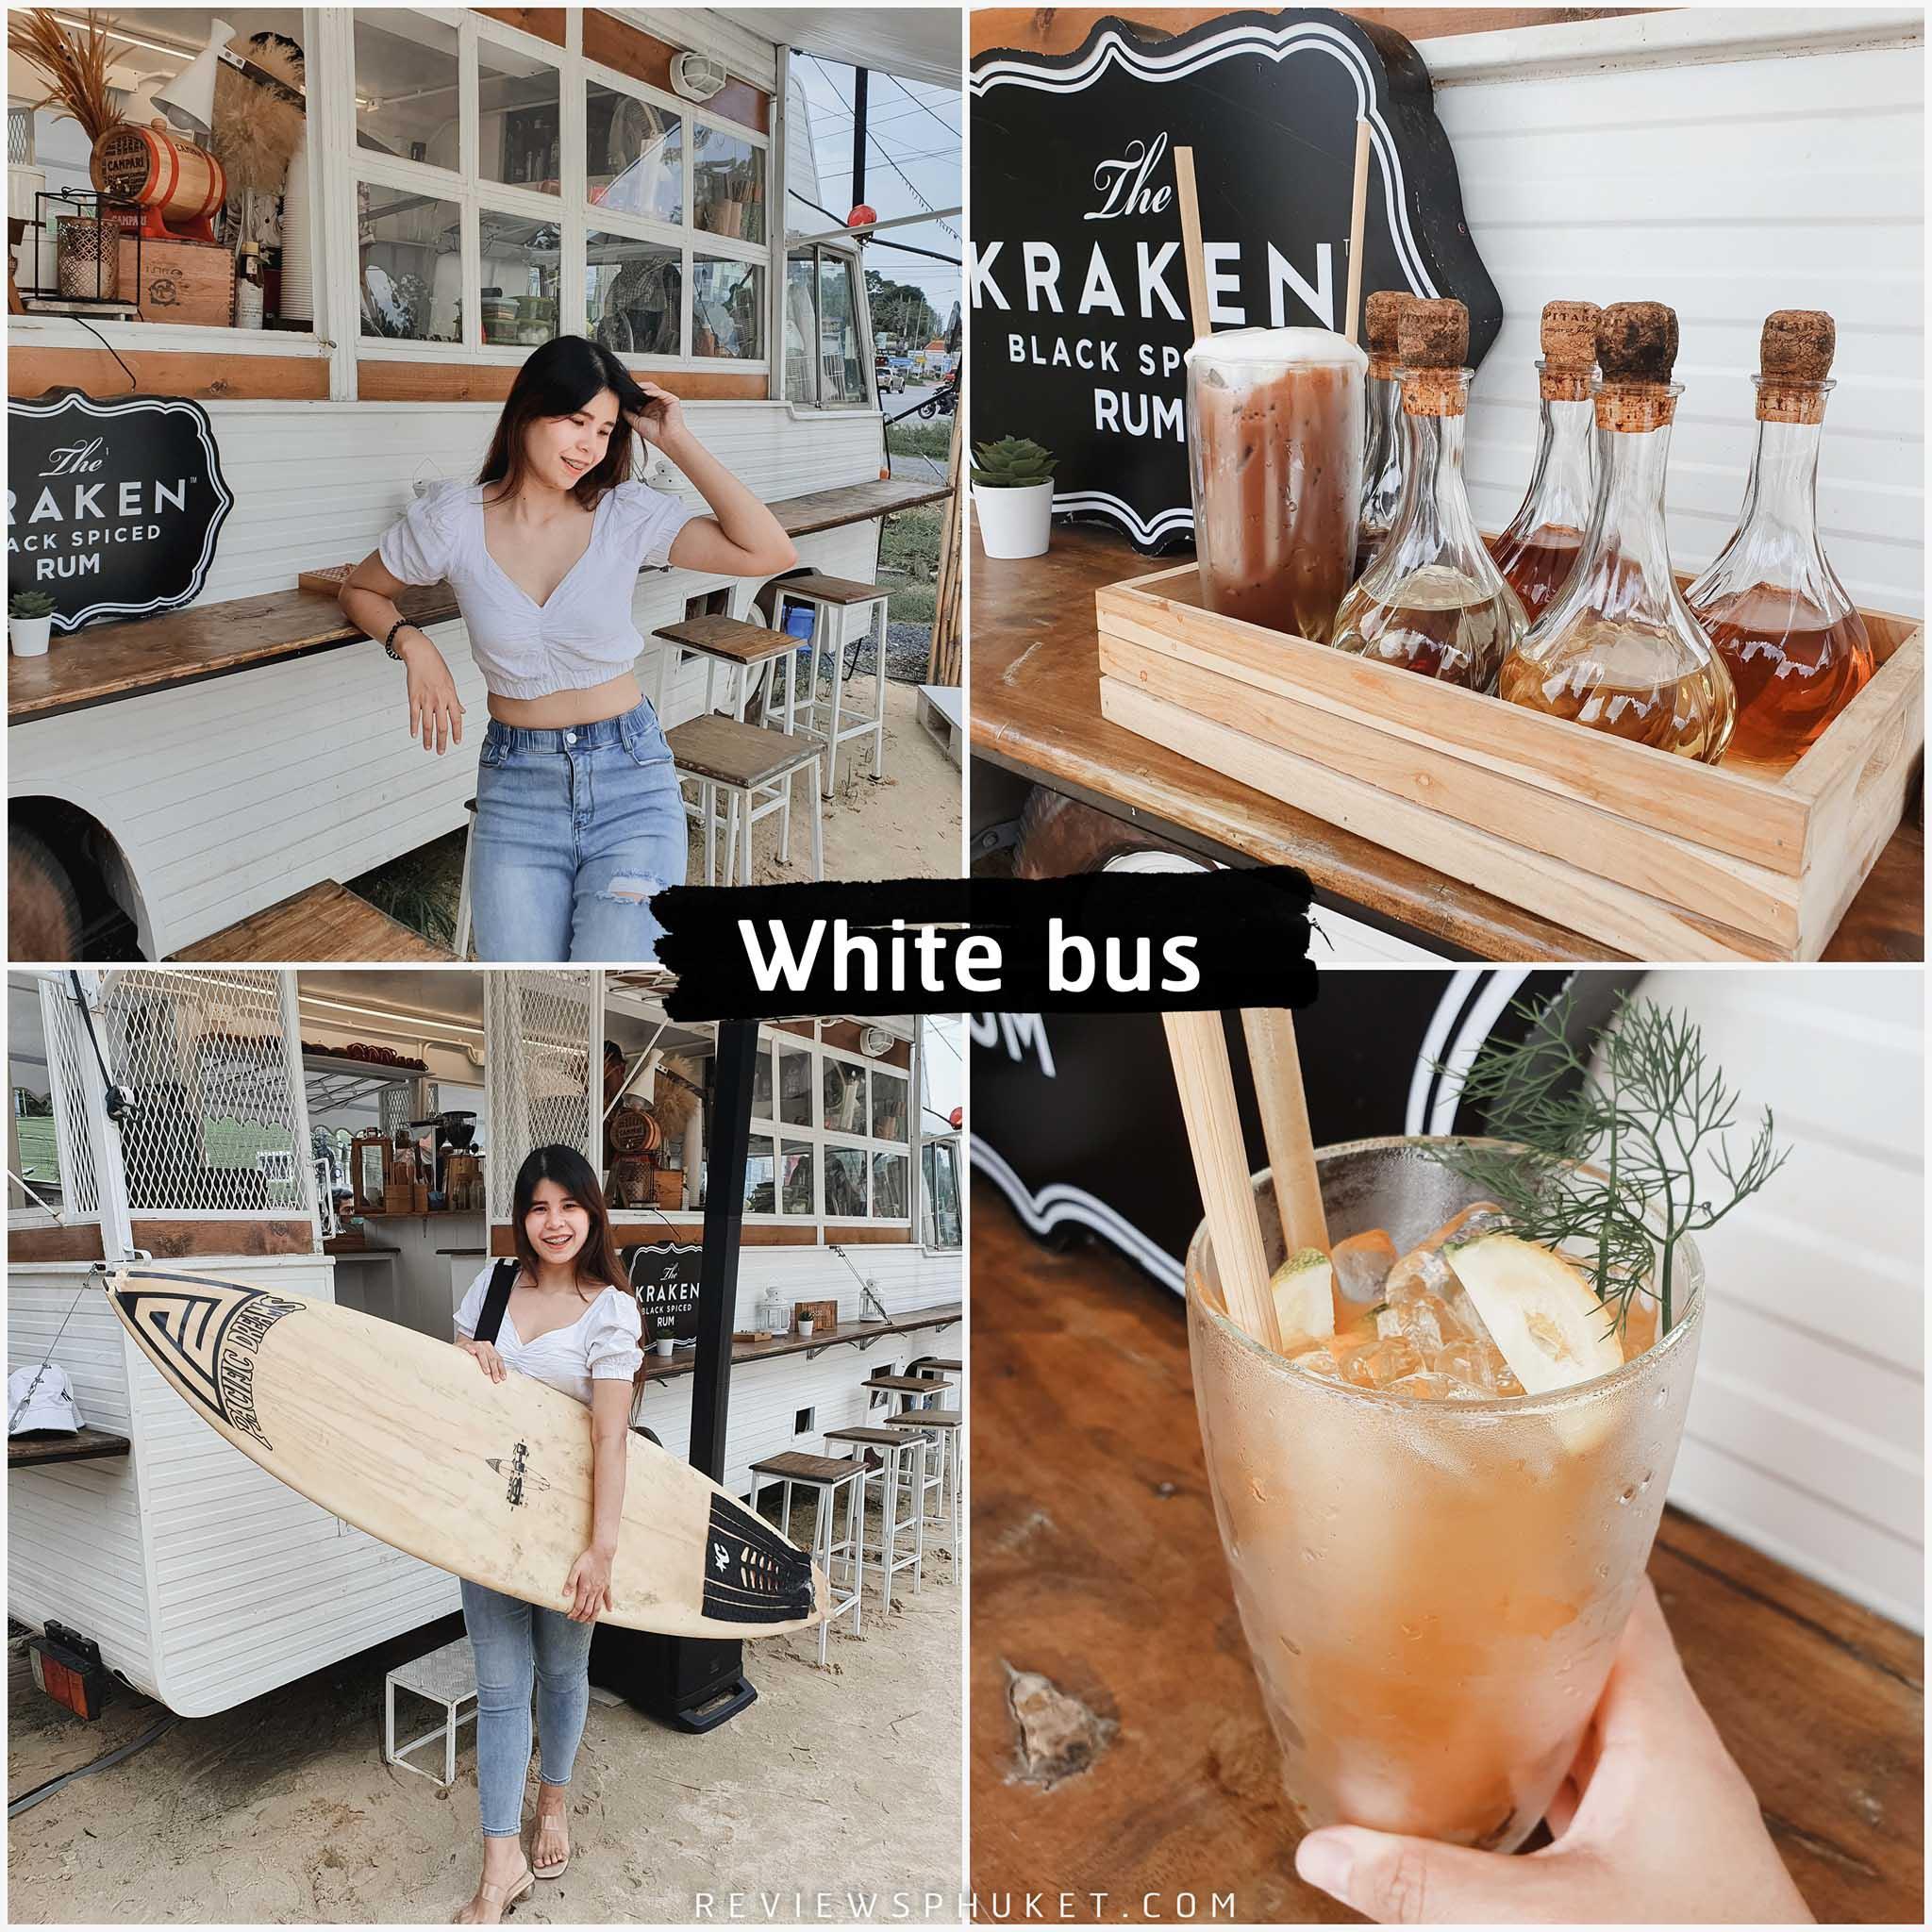 White-Bus-Speakeasy-Bar-คาเฟ่รถบัสสุดสวยมีความคิดสร้างสรรค์-ร้านมีหลายสไตล์ให้เลือกนั่งปักหมุดเช็คอินกัน คลิกที่นี่ ภูเก็ต,คาเฟ่,ที่เที่ยว,ร้านกาแฟ,เด็ด,อร่อย,ต้องลอง